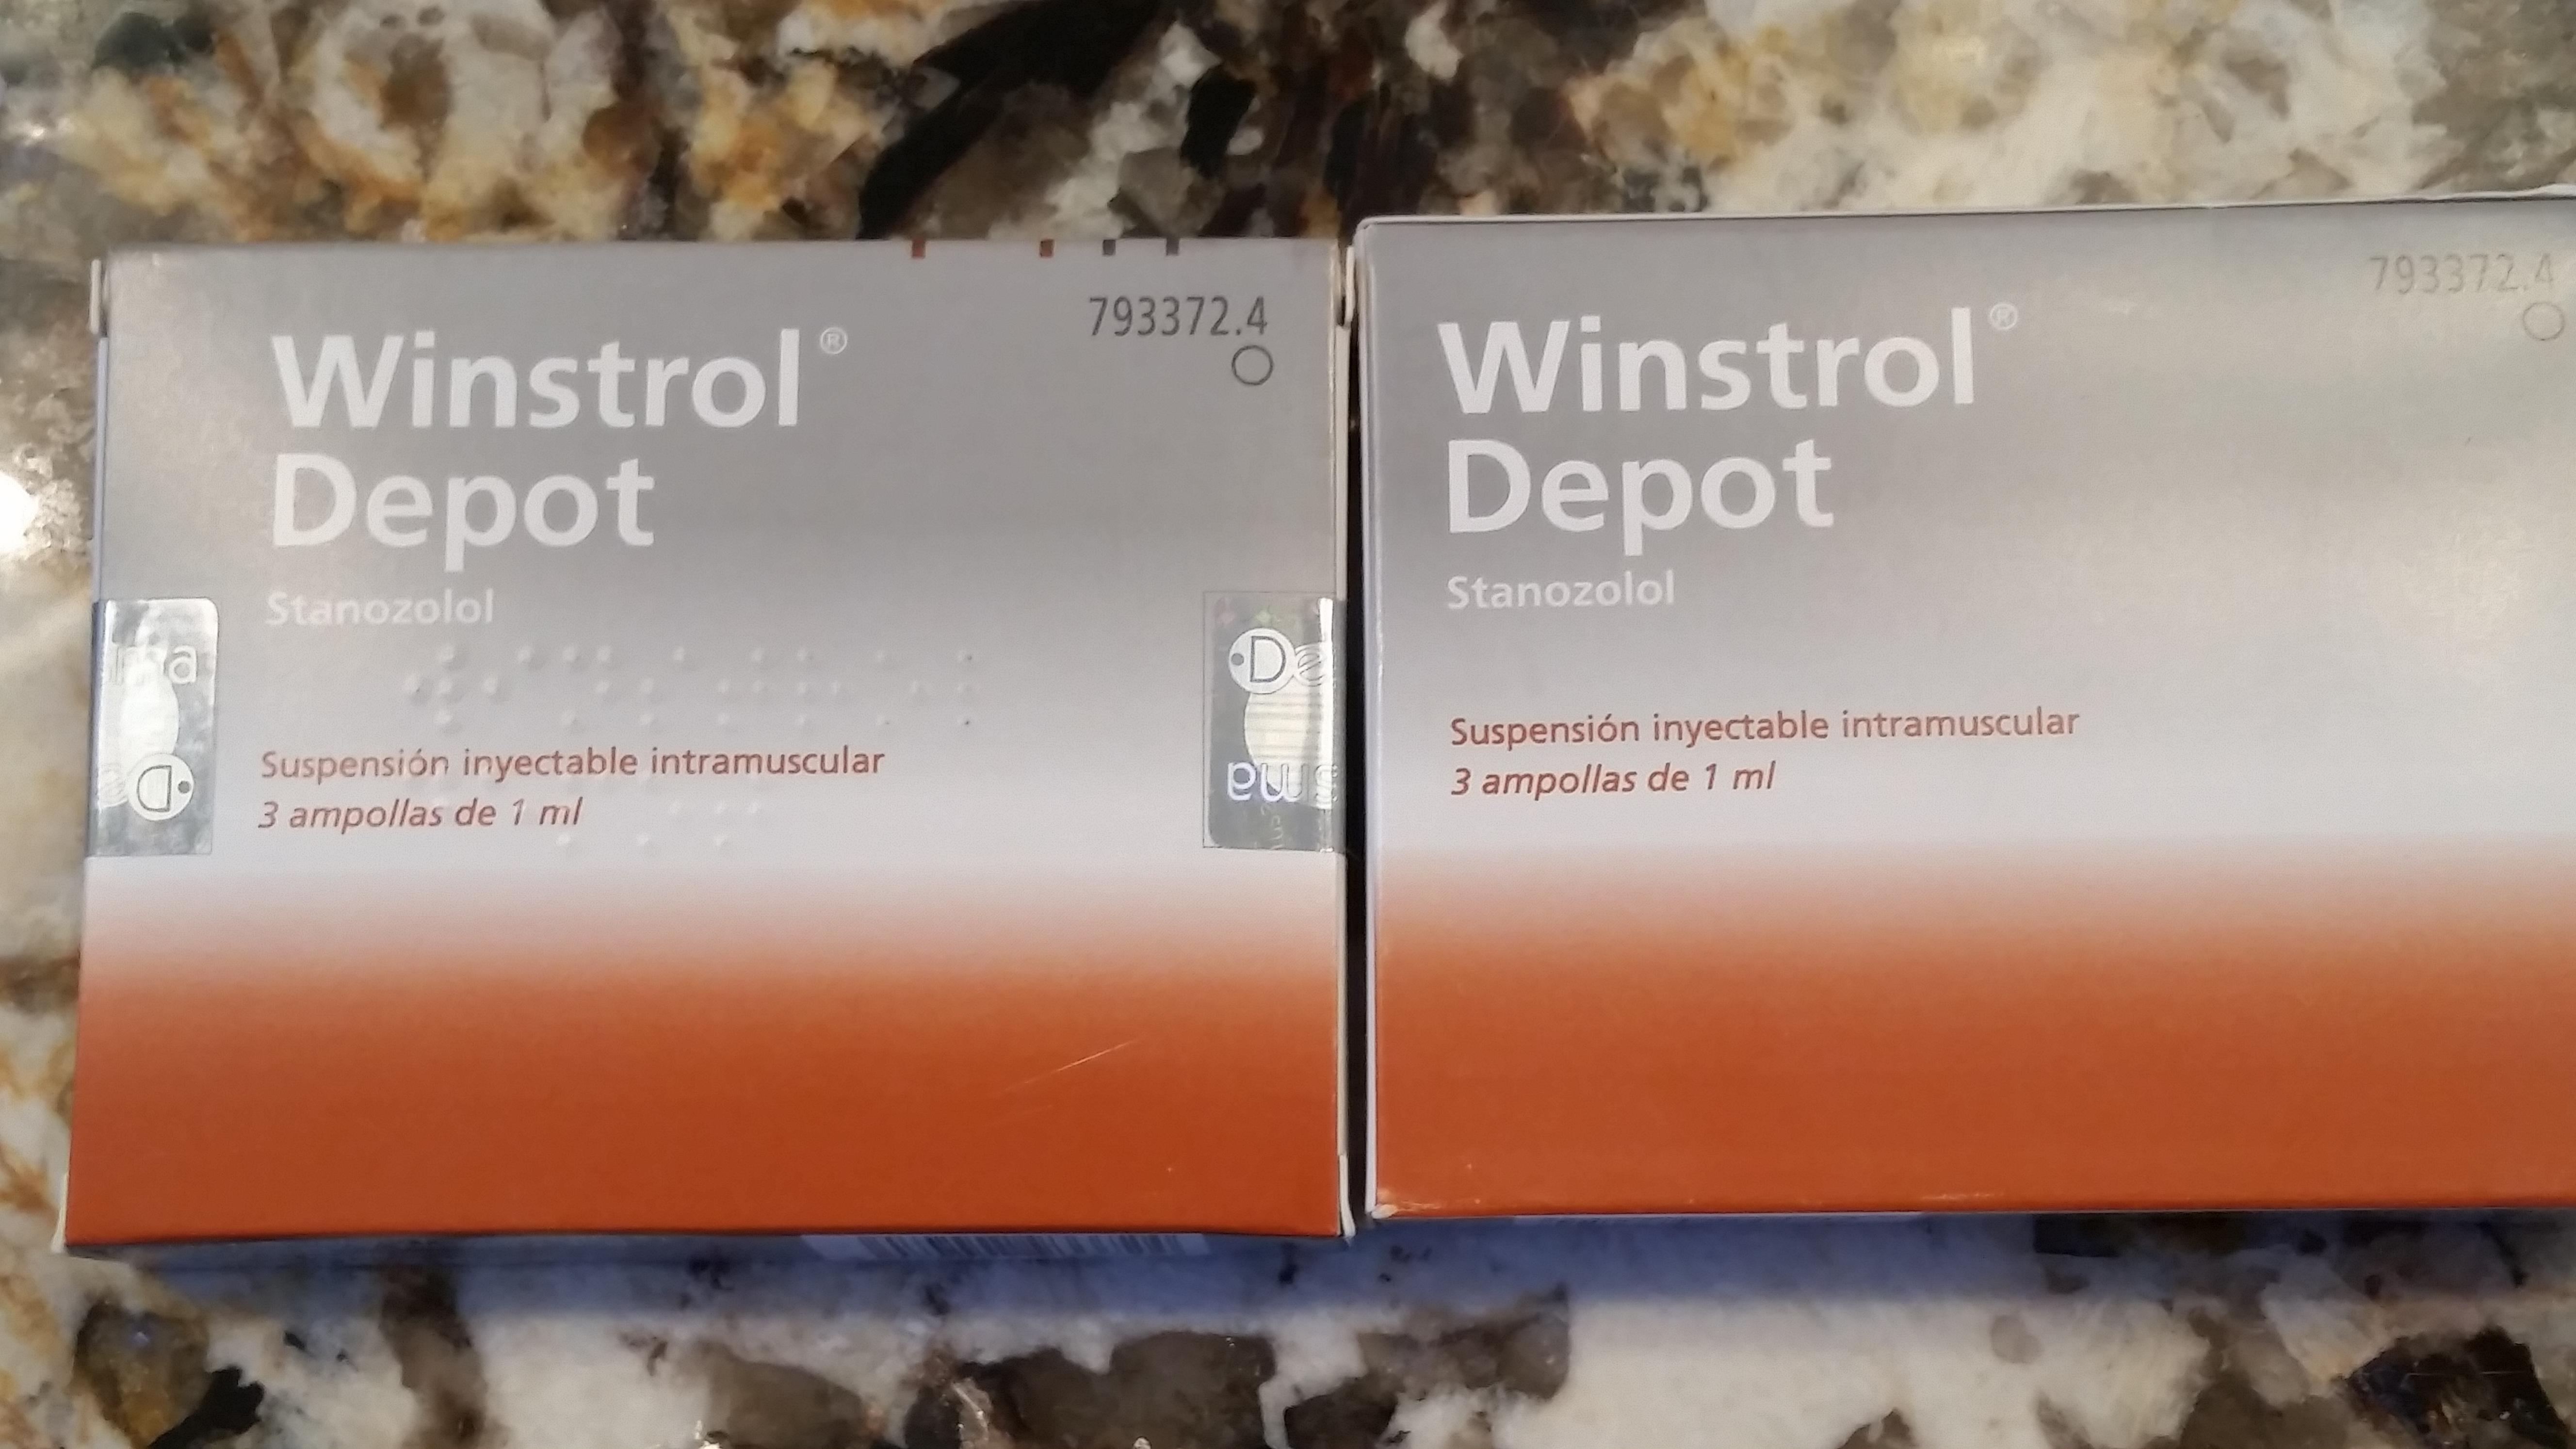 winstrol depot falso